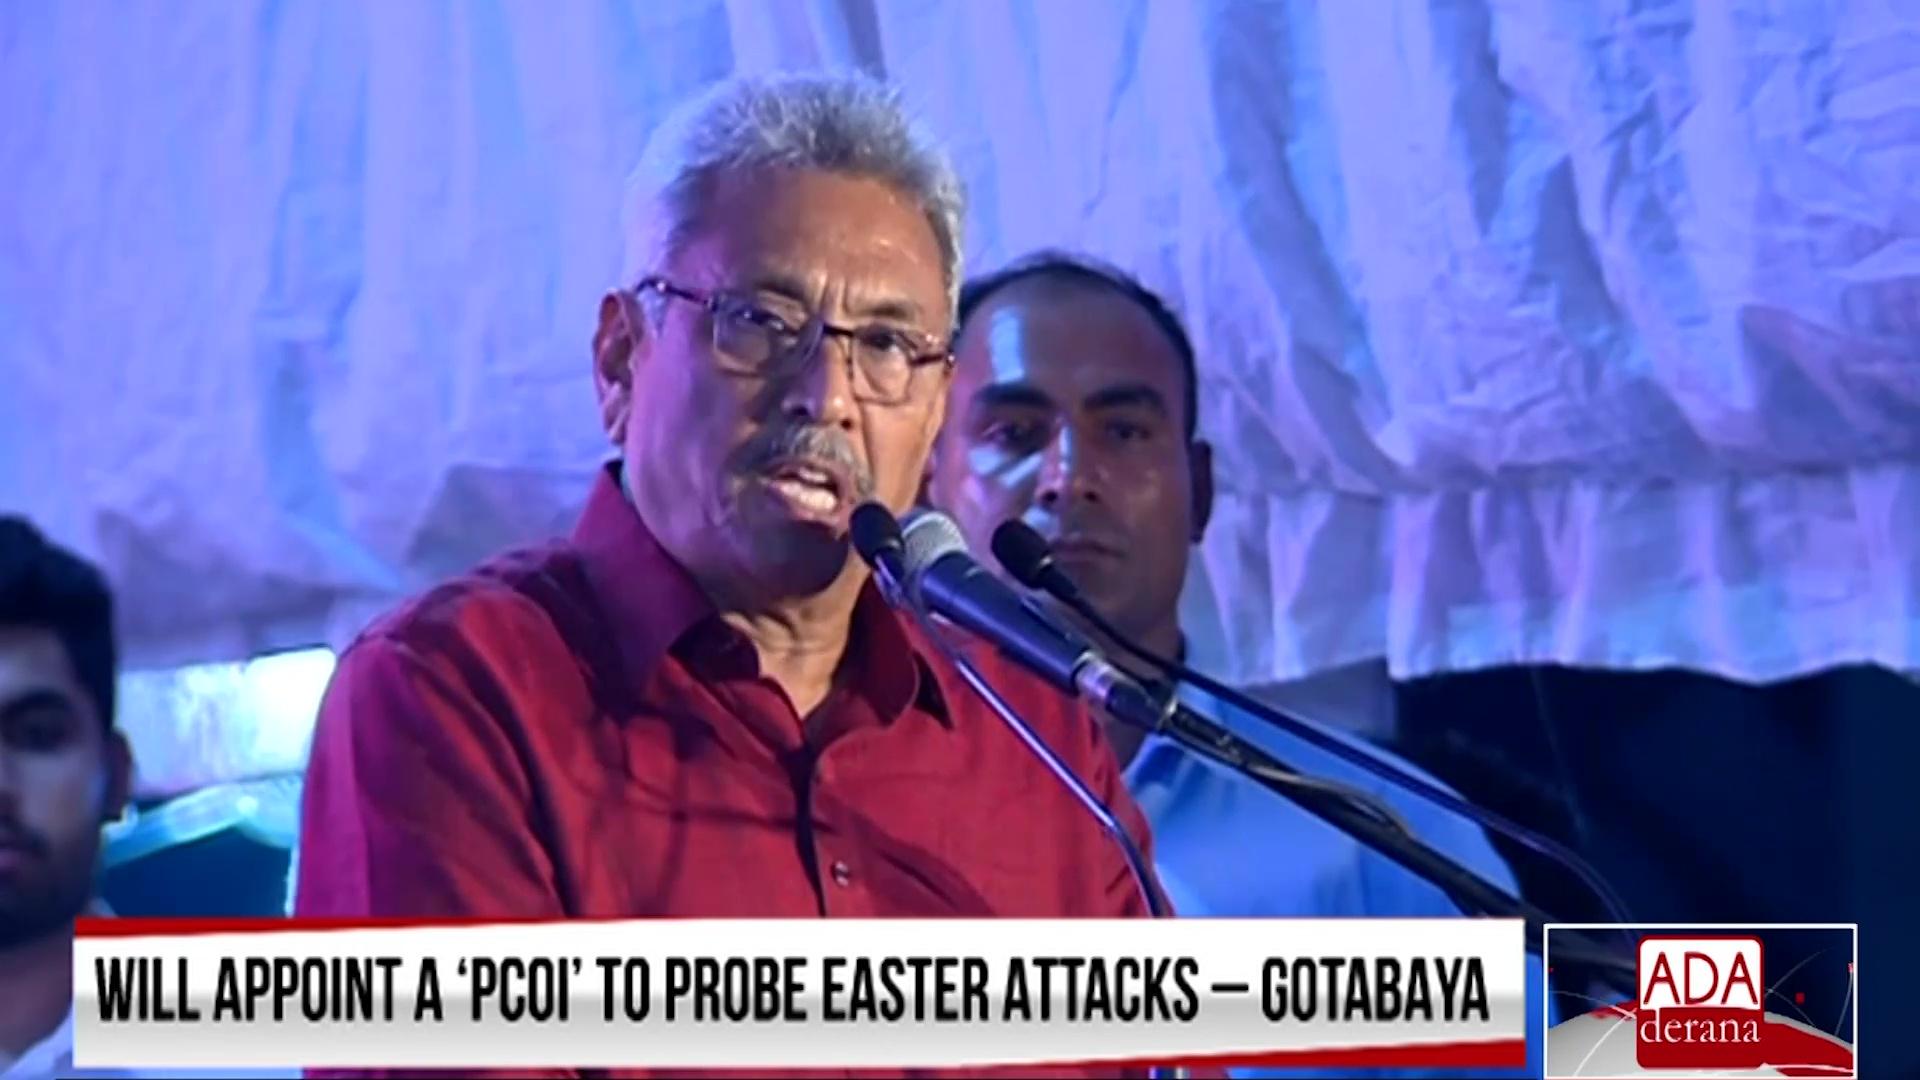 Gotabaya promises to fulfil Cardinal's request (English)